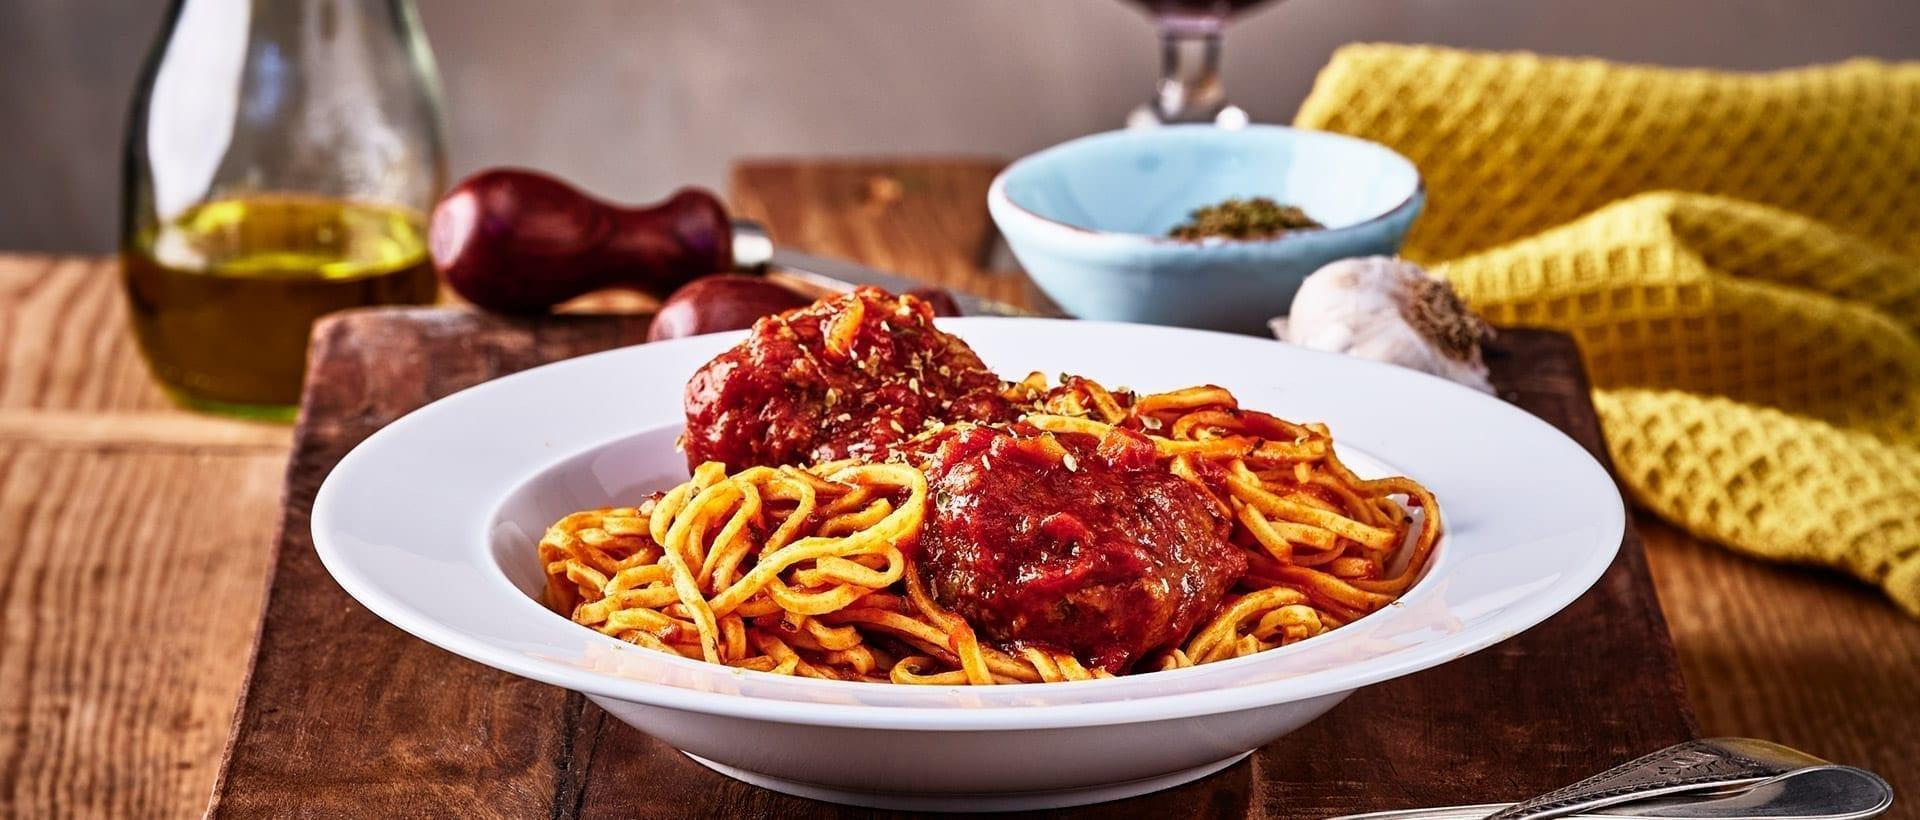 Spaghetti tuttup neqaanik boor'lulerlugu